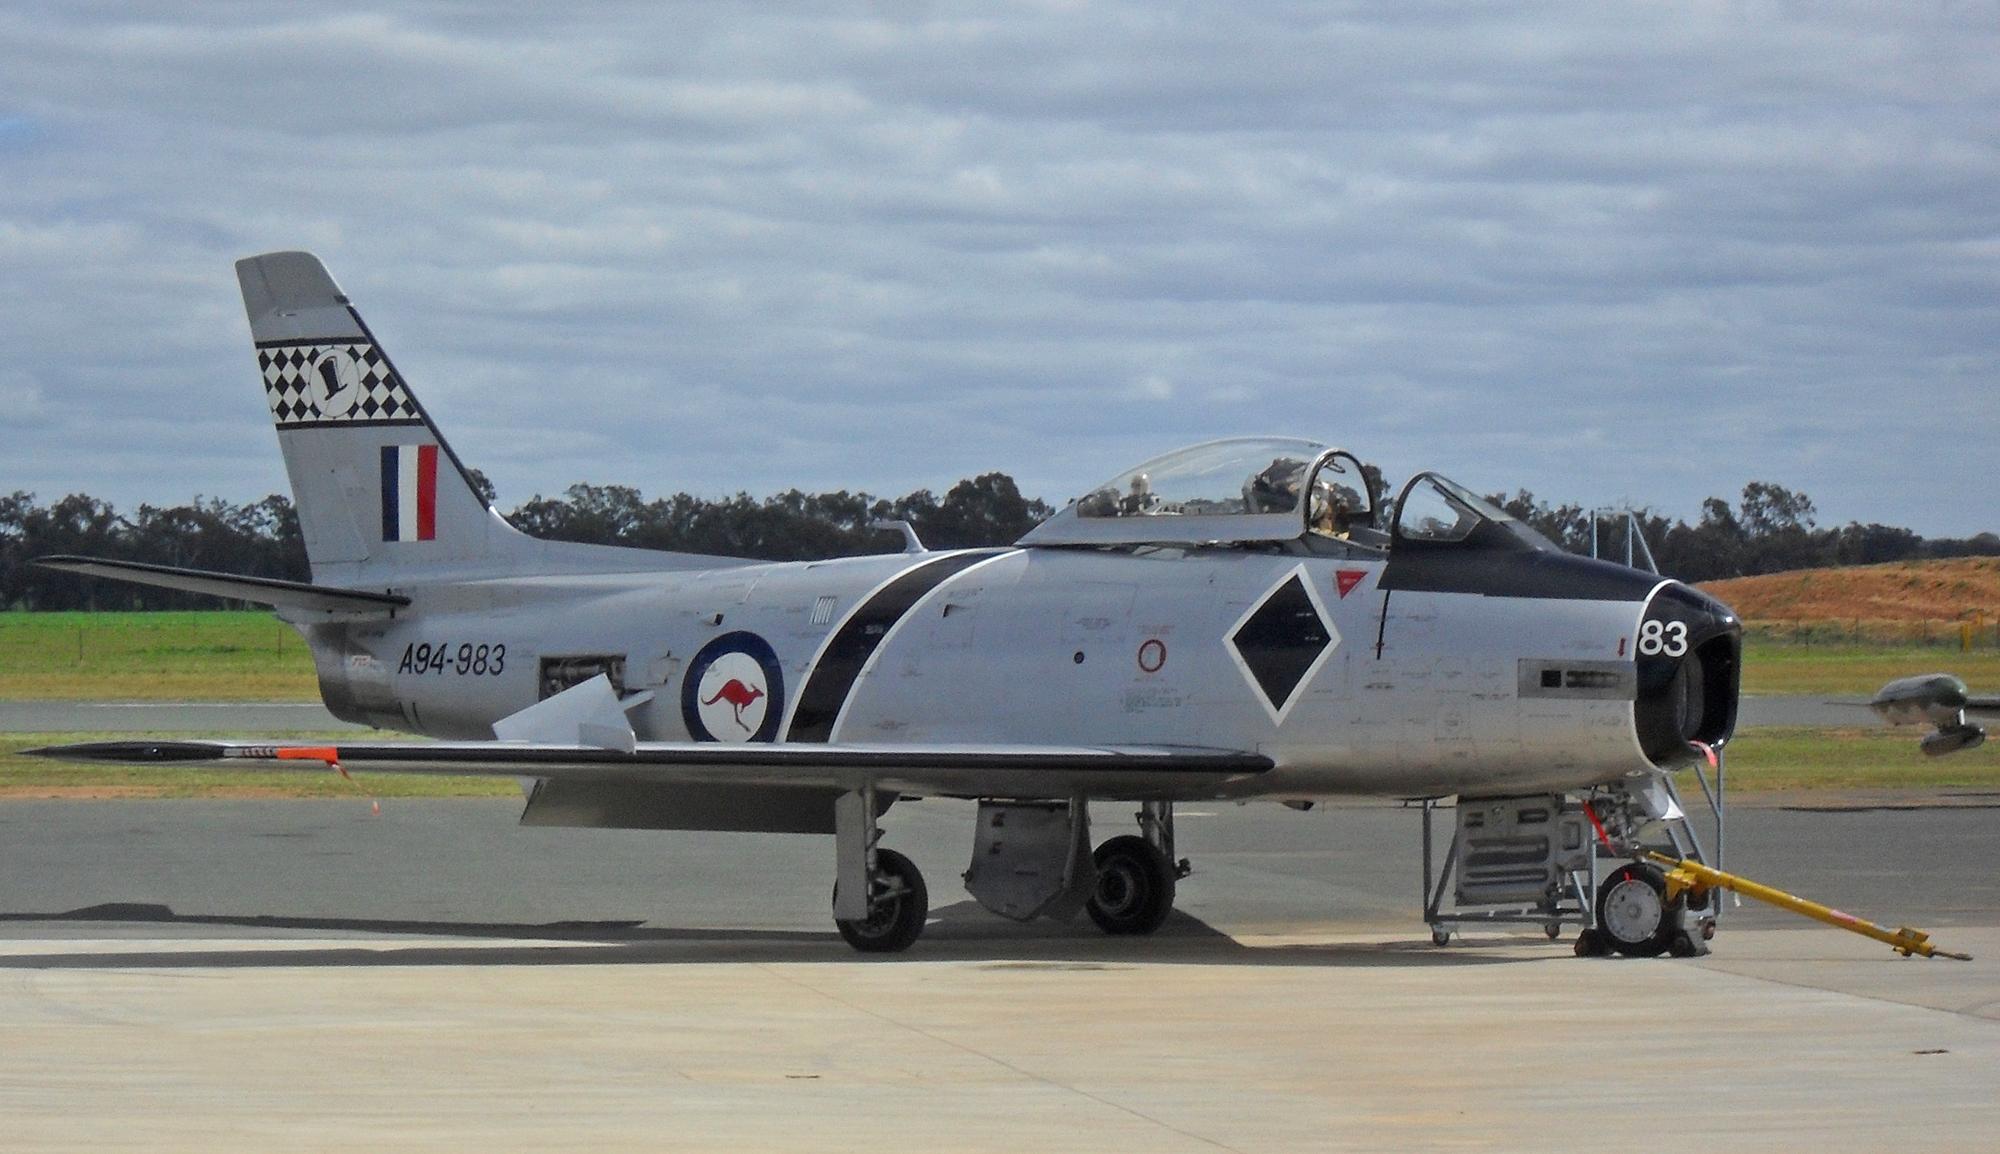 File:CAC Sabre Mk.32 - A94-983.jpg